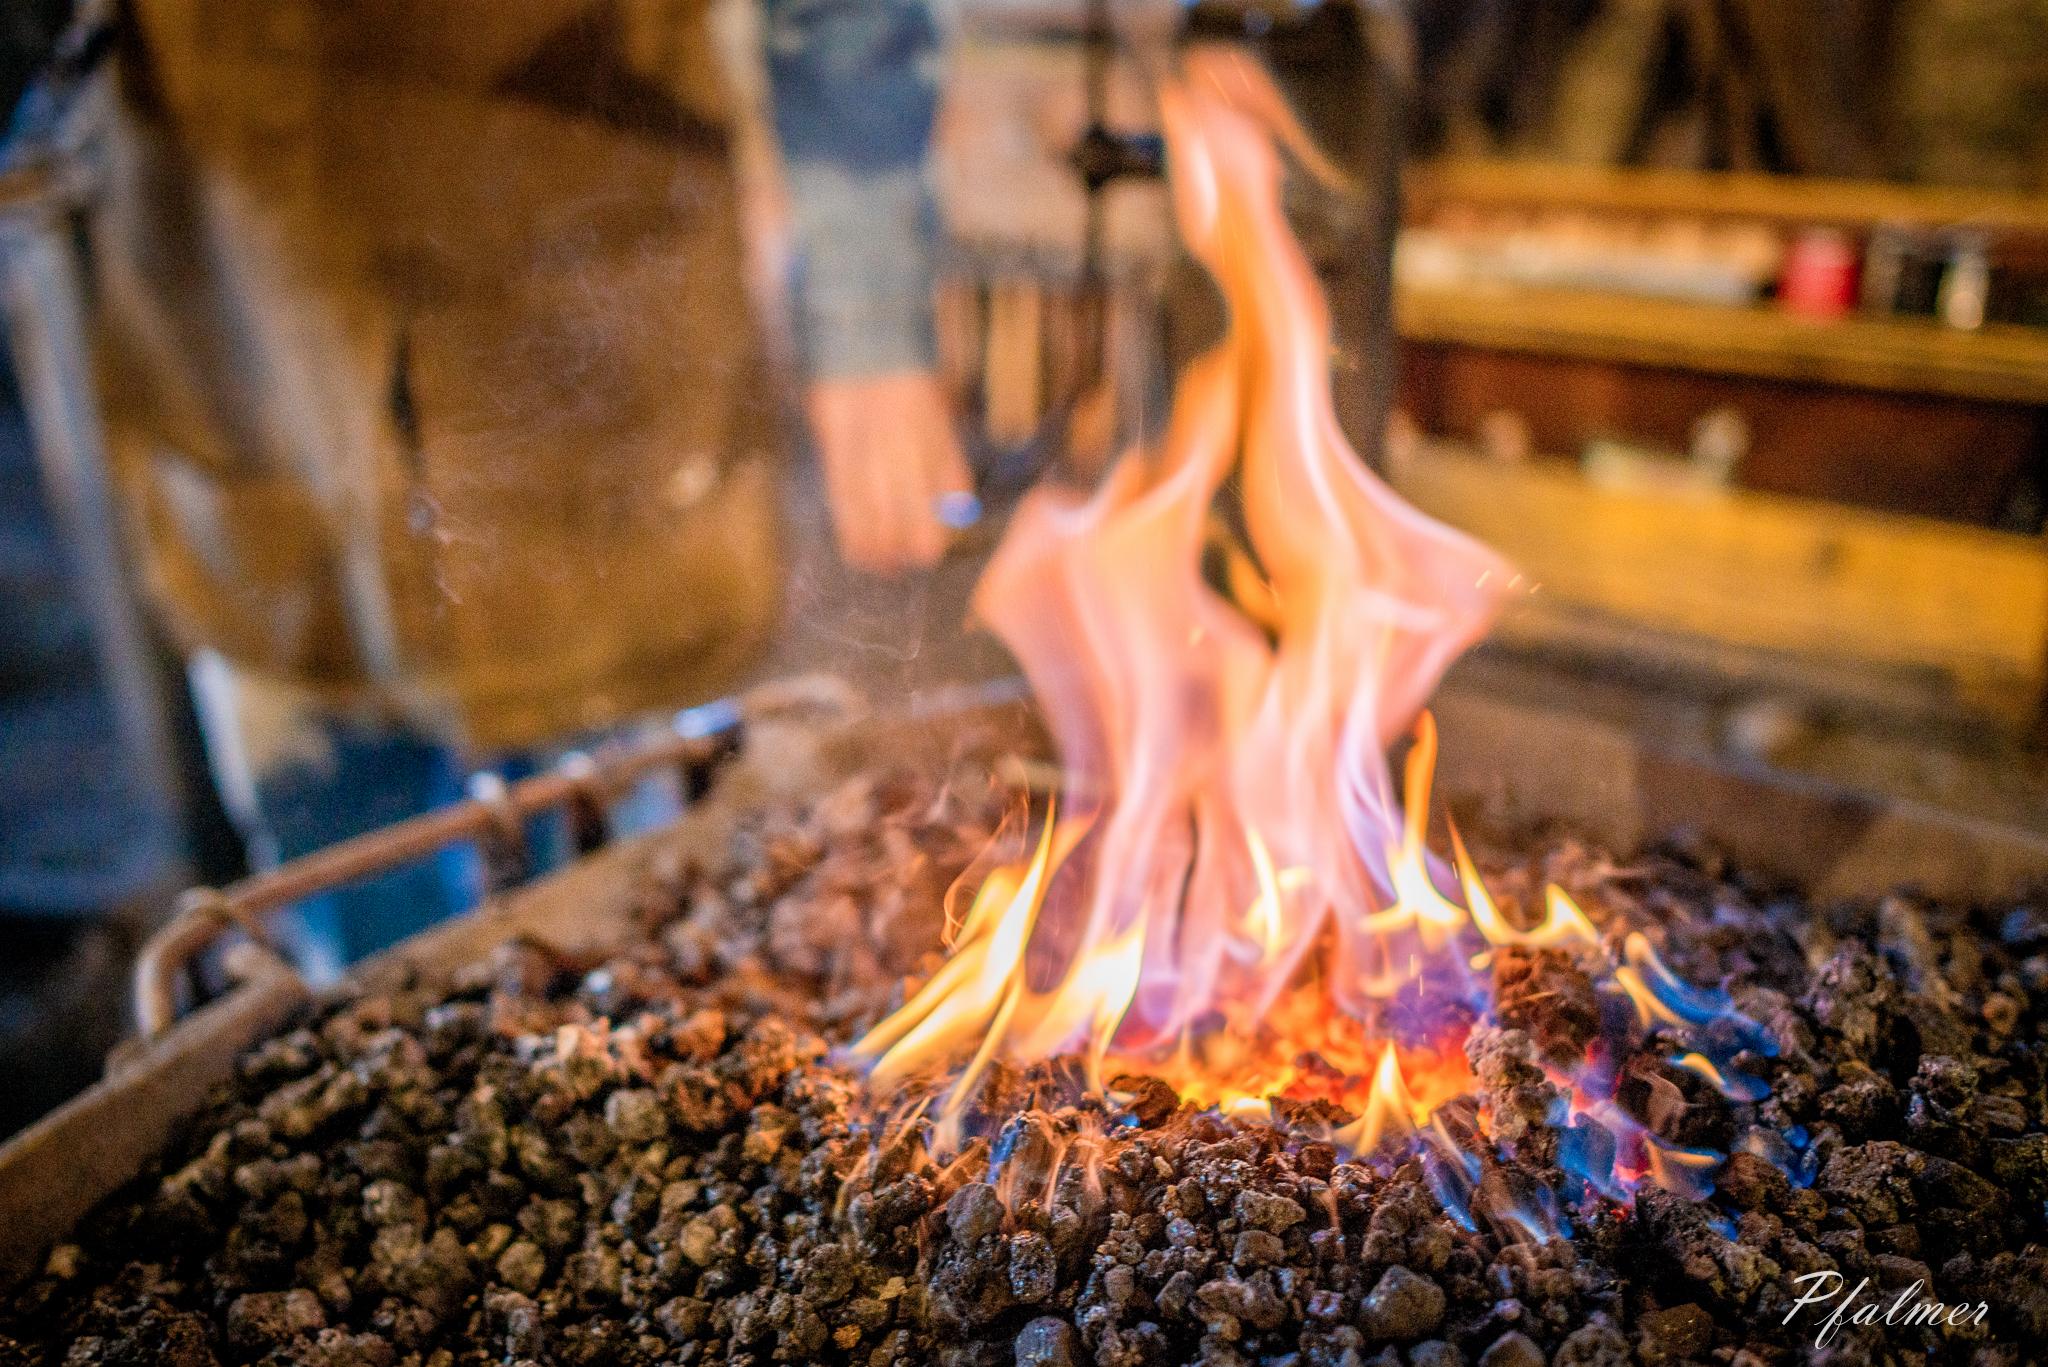 Blacksmith-14.jpg